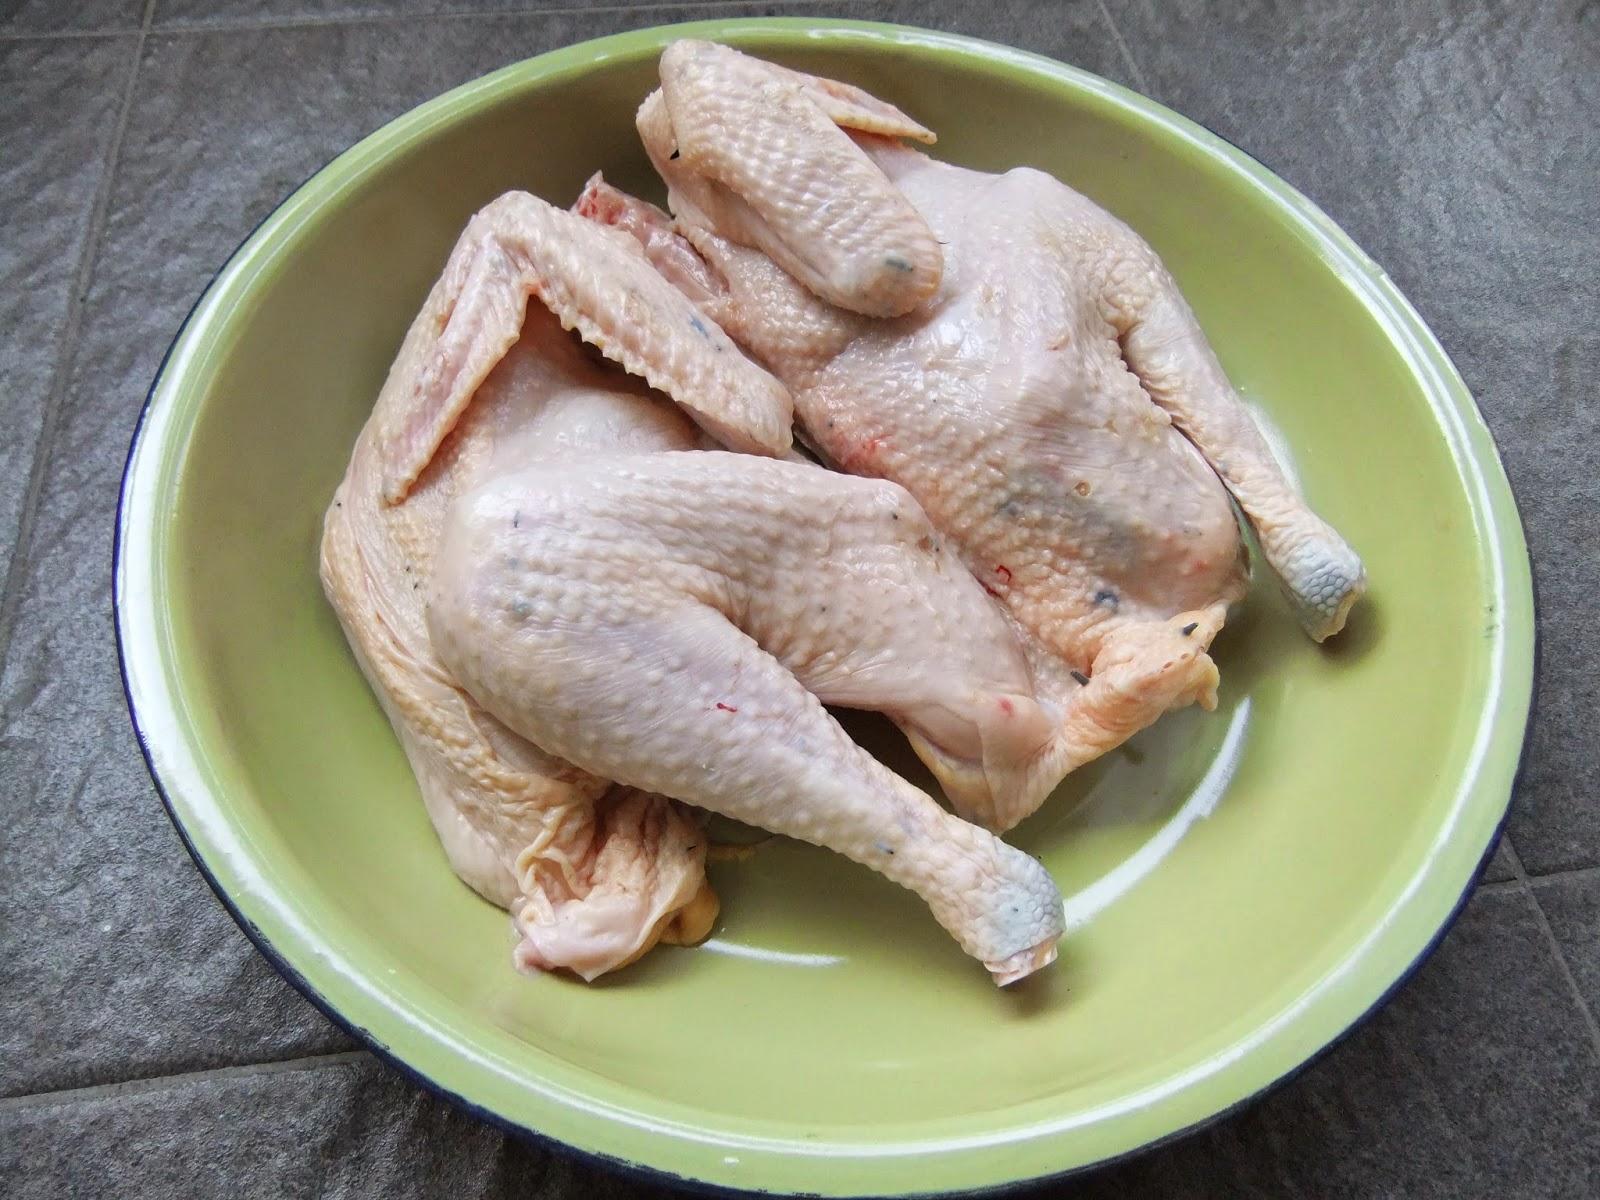 ayam kampung keras, perbedan daging ayam kampung